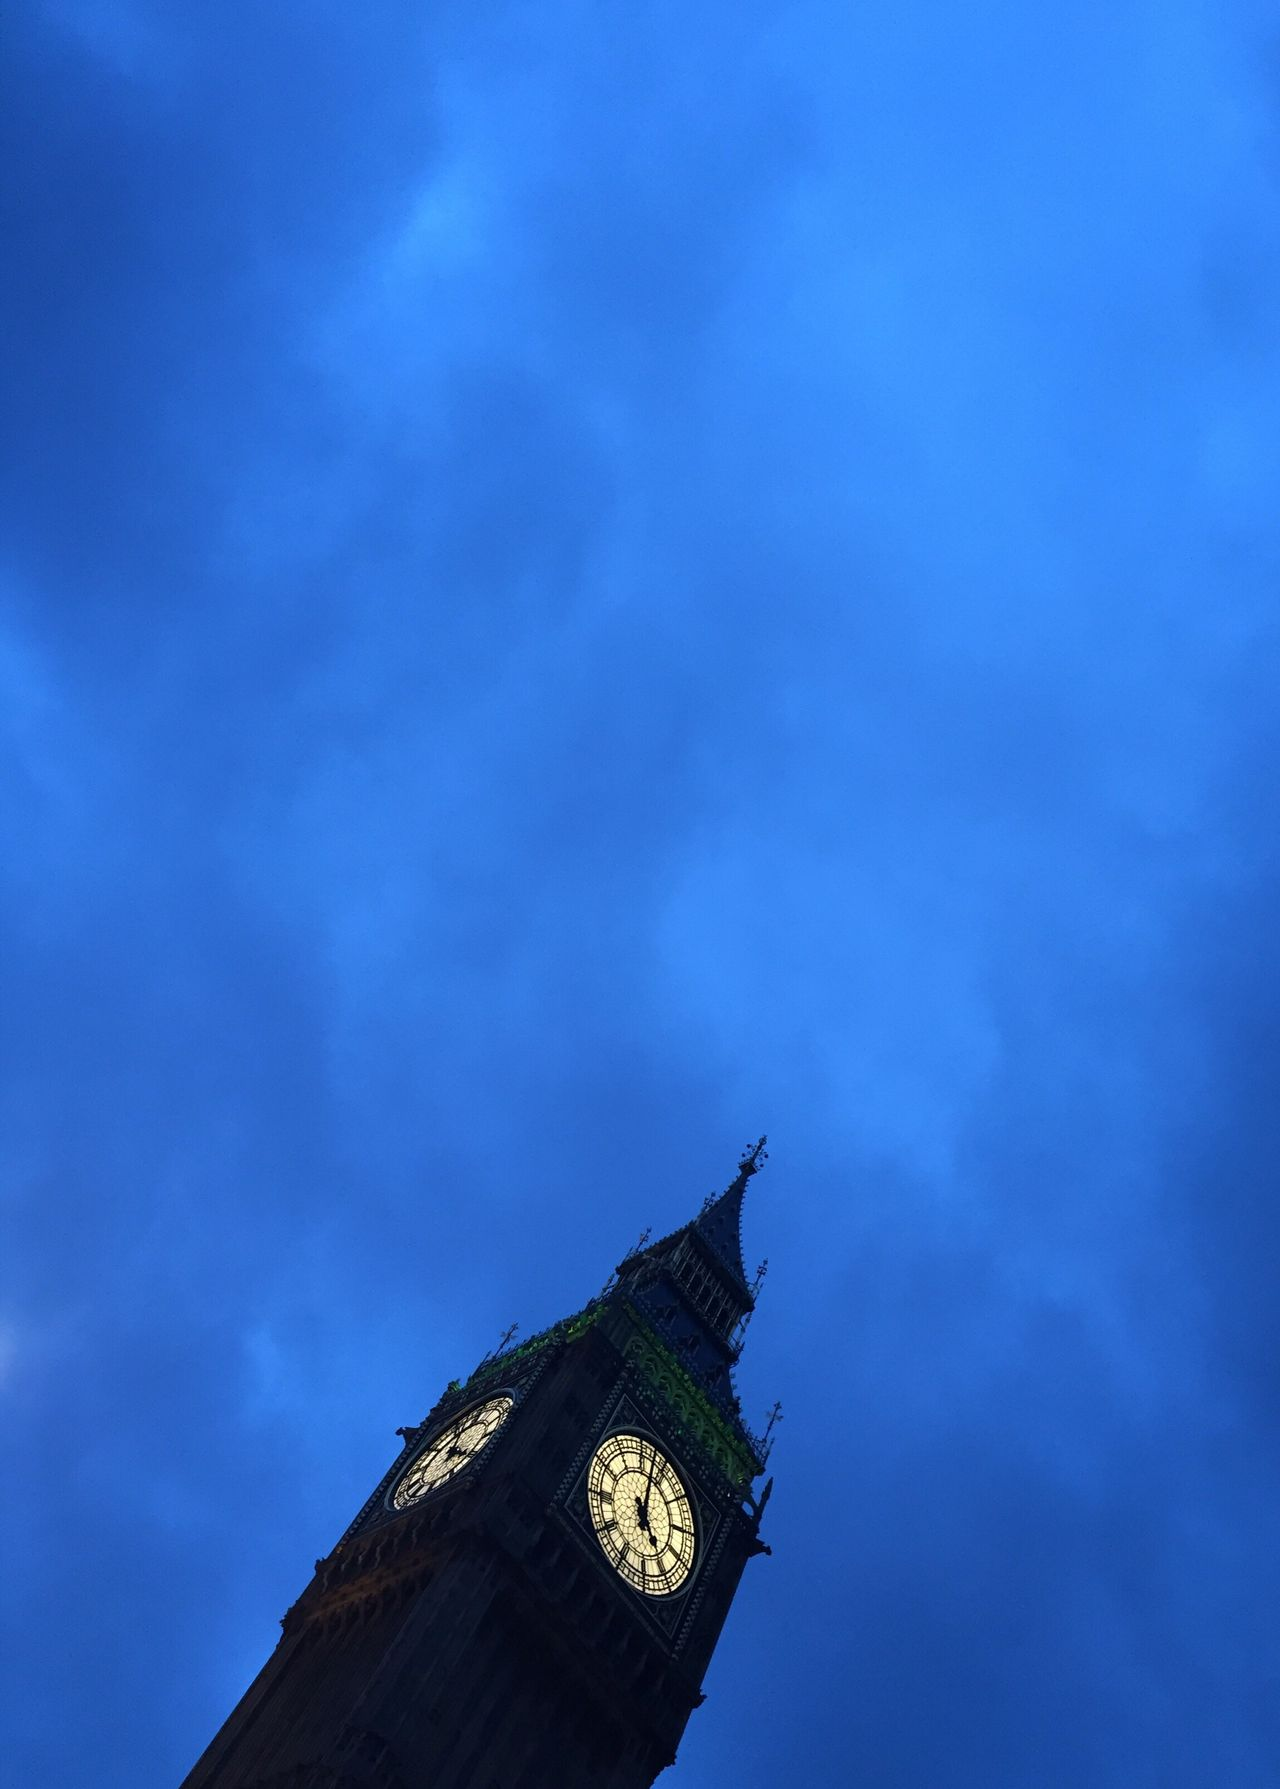 Architecture No People Blue Clock Tower Clock Big Ben Travel Destinations London Neighborhood Map Night Cloud - Sky